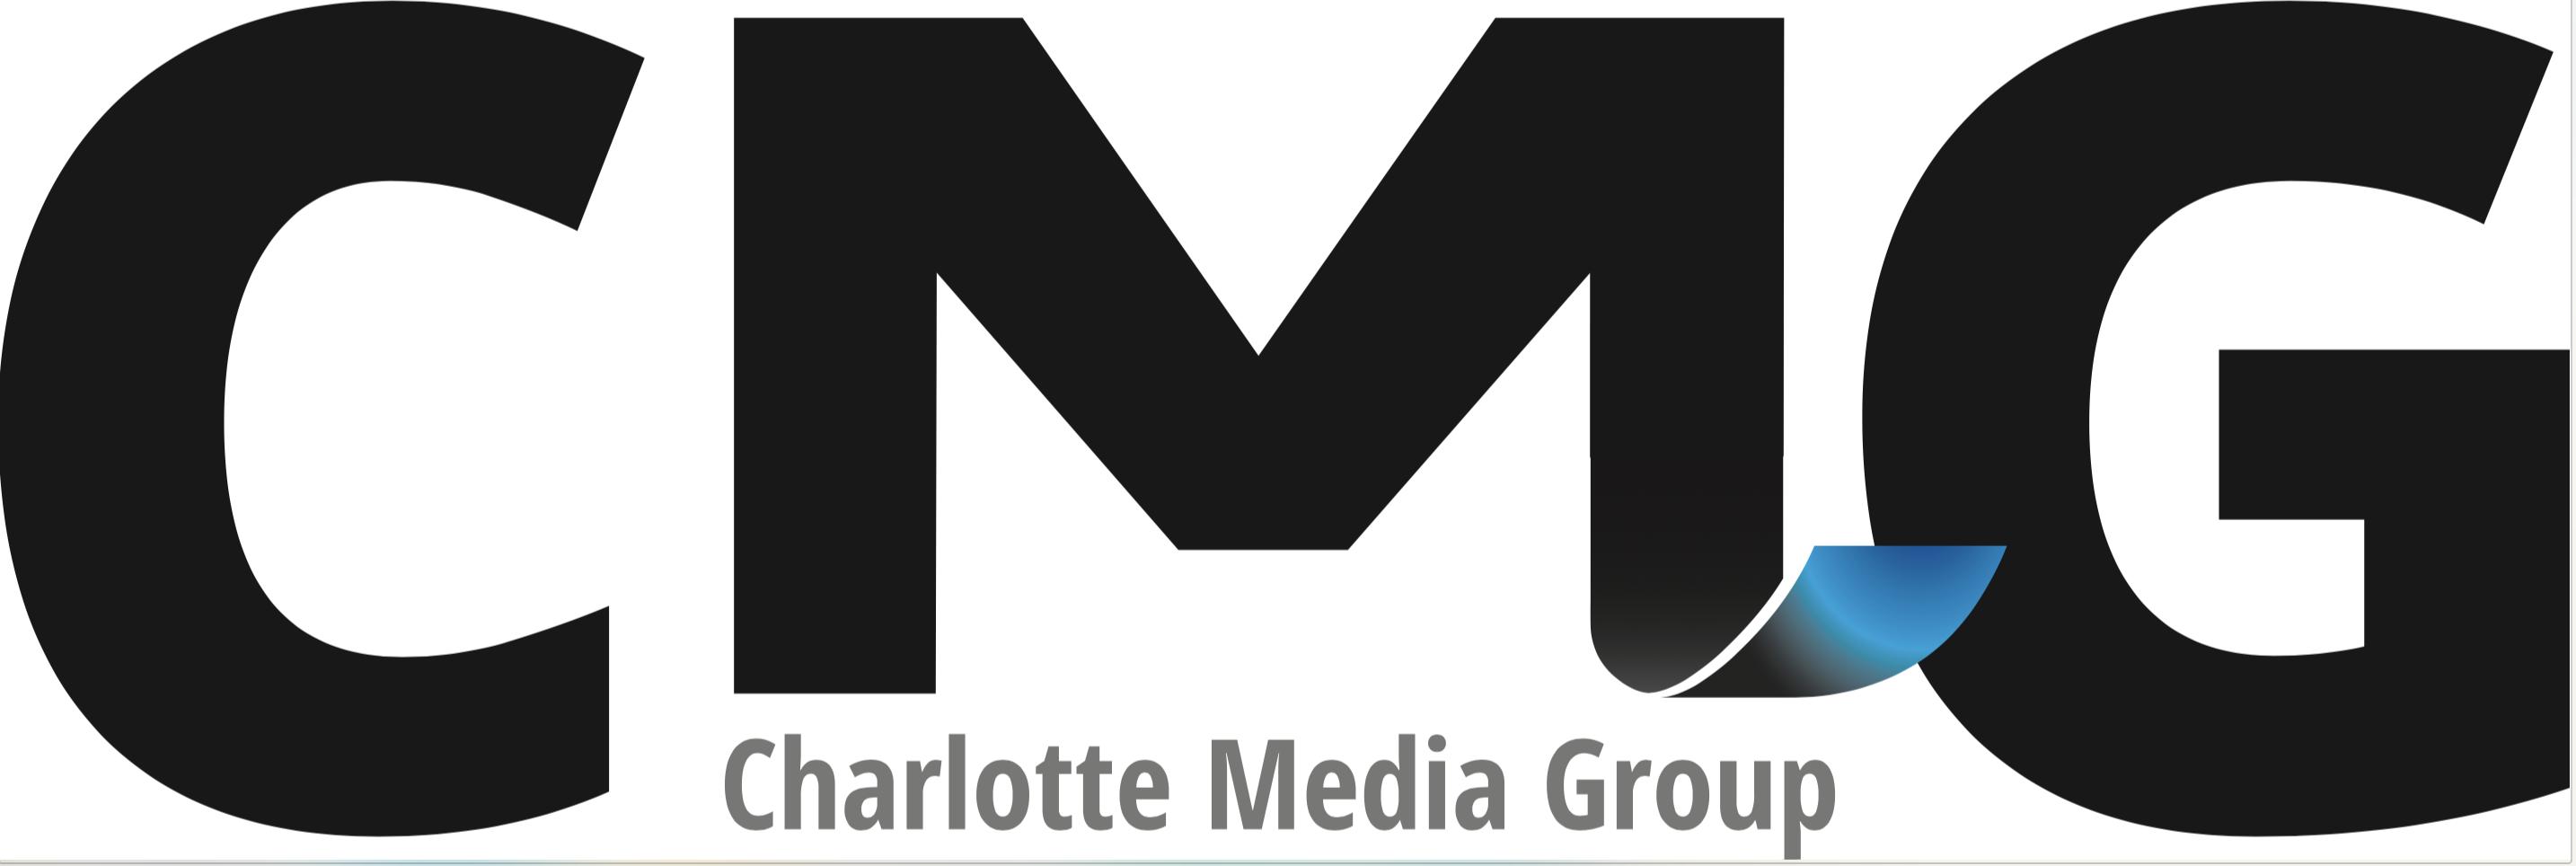 CharlotteWeekly-Logo